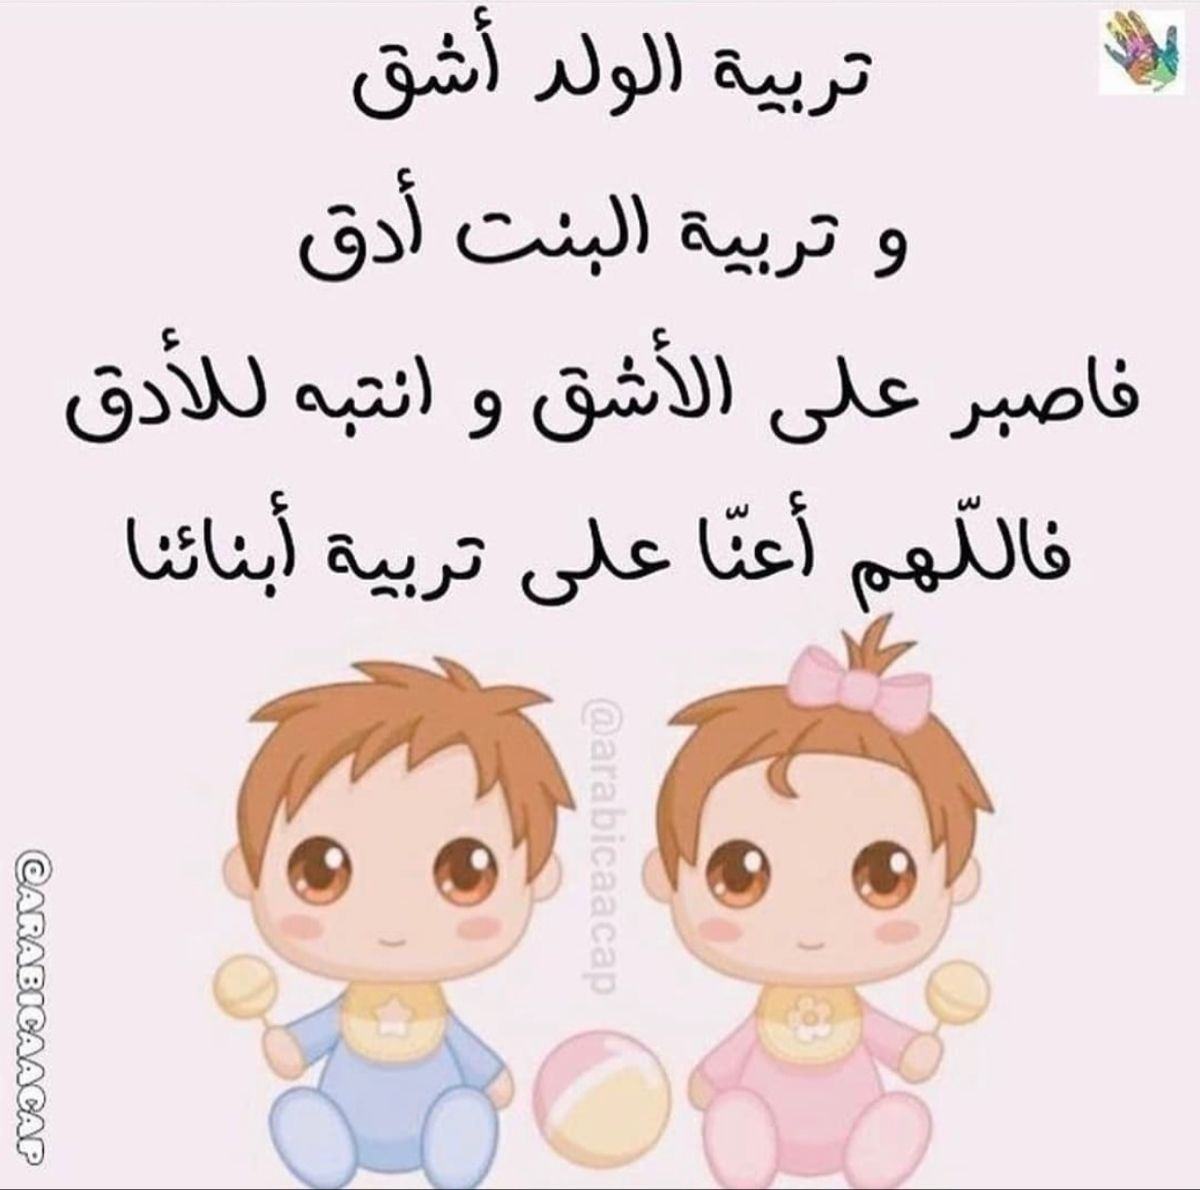 Pin By Re0o0ry ه م س ات ع اب ر ة On تحفيز Motivations In 2021 Framed Wallpaper Funny Arabic Quotes Baby Education